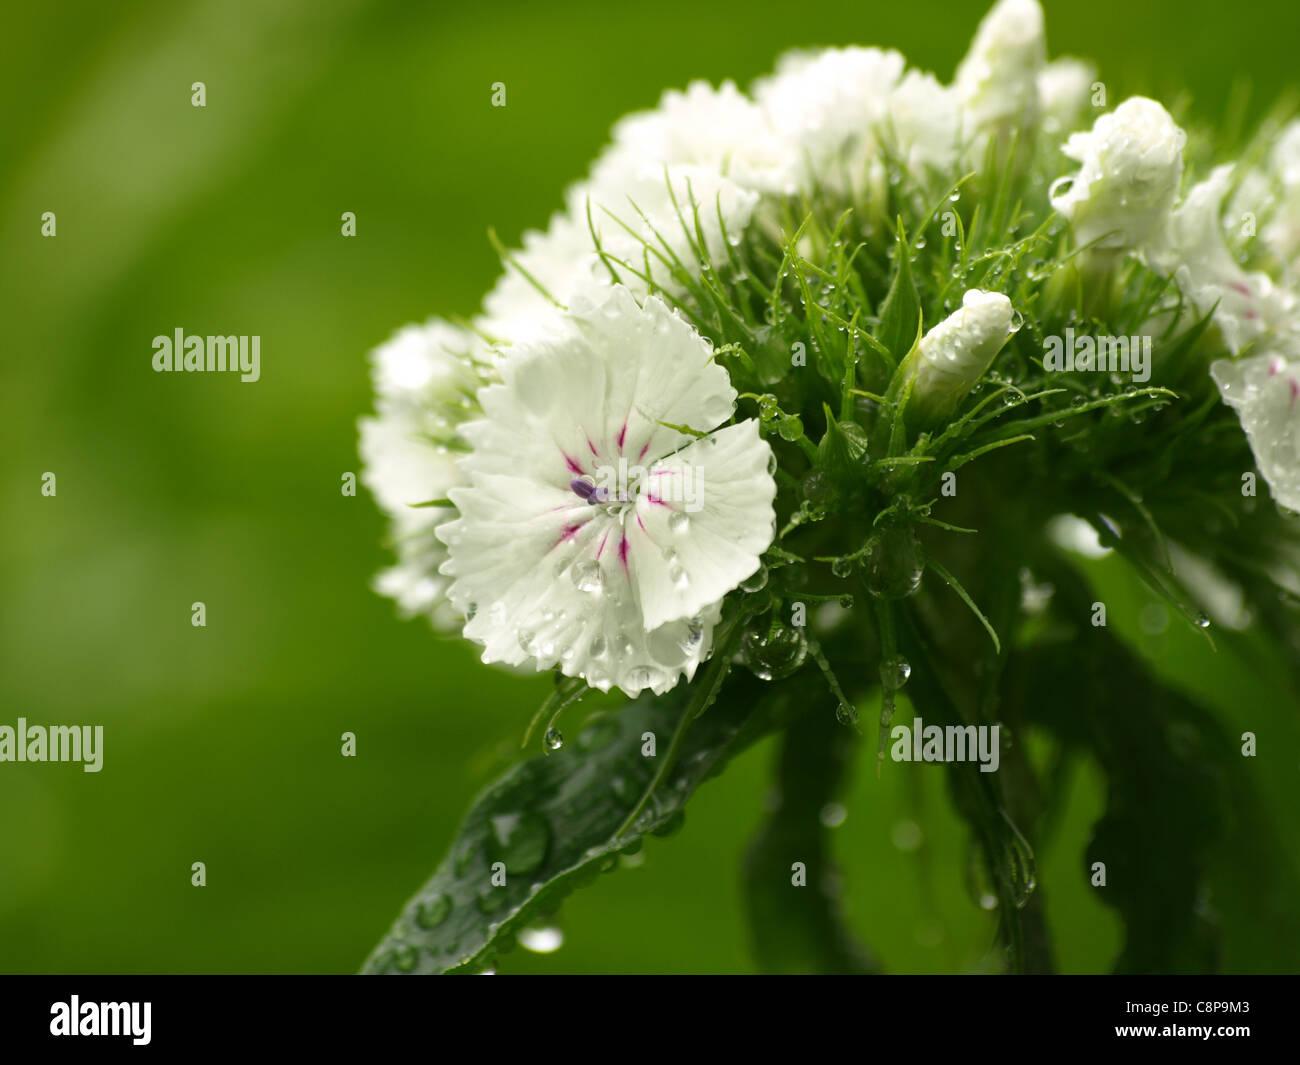 Sweet William / Dianthus barbatus / Bartnelke / Nelke with raindrops - Stock Image